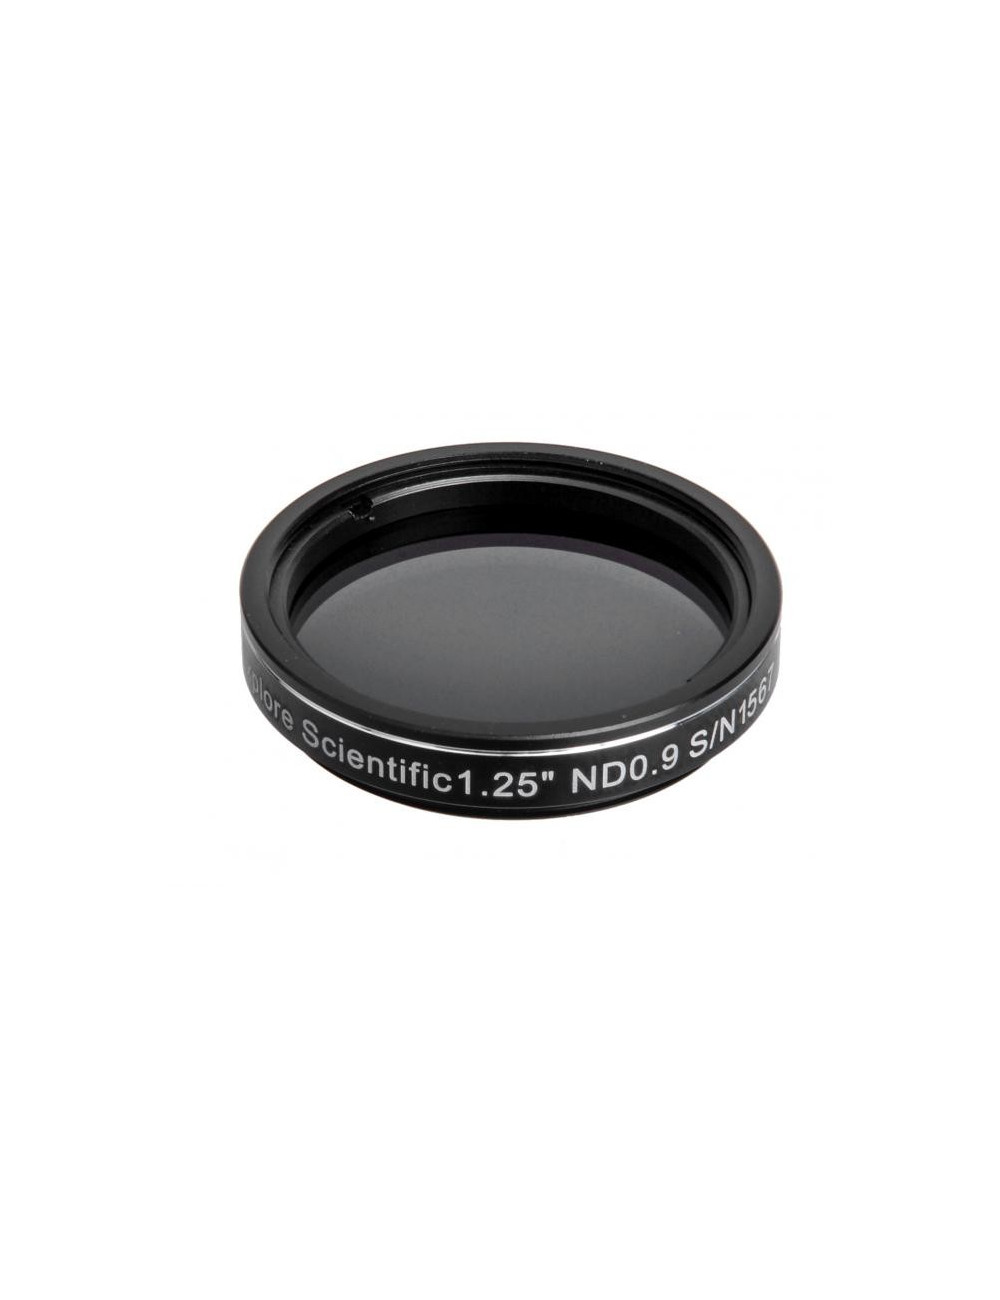 Filtre ND 0.9 neutre 13 % 31,75 mm Explore Scientific